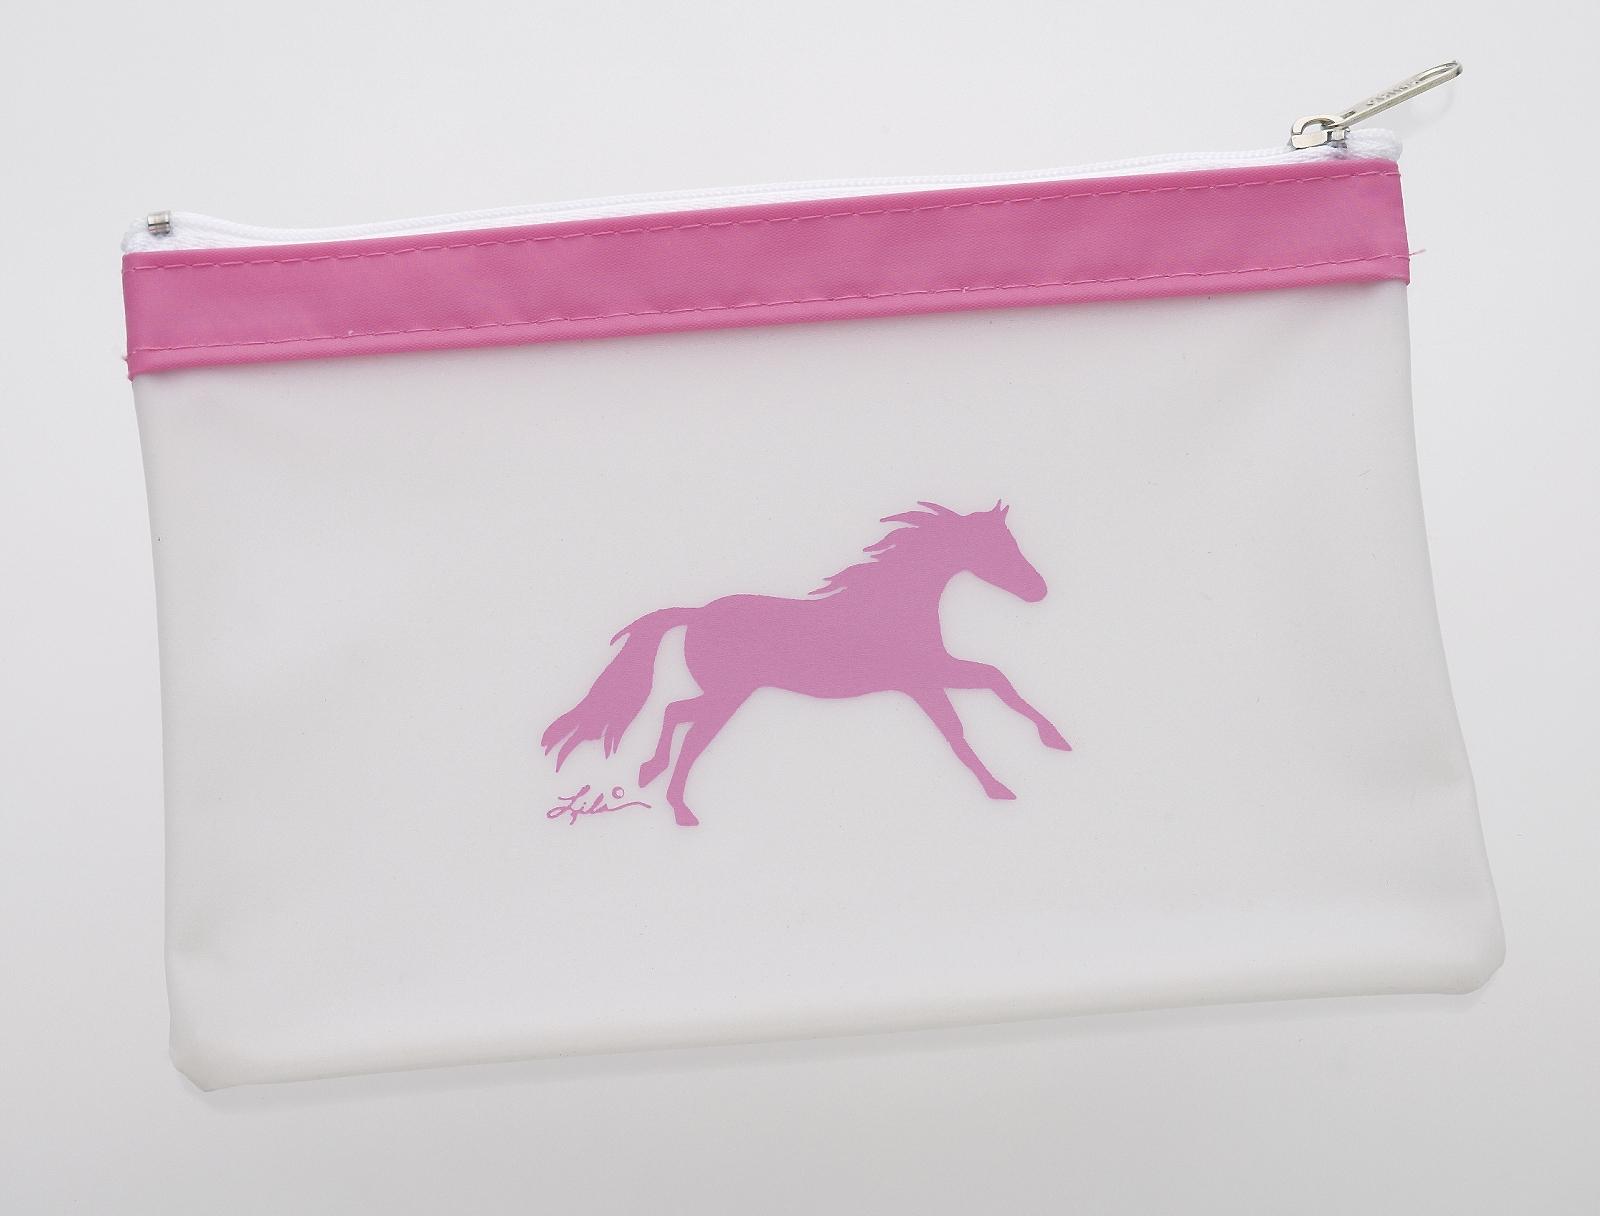 Lila Blakeslee Galloping Horse Pink Trim Cosmetic Bag